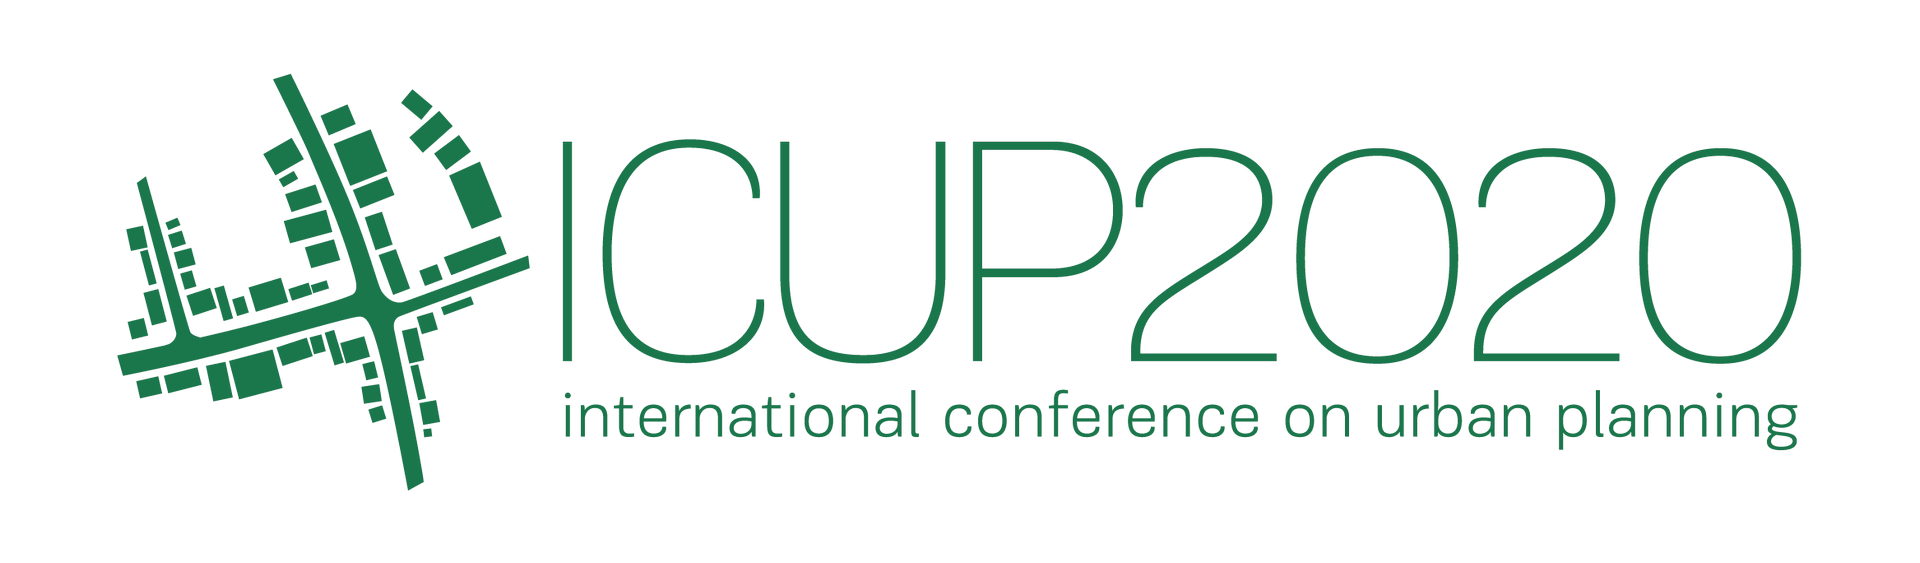 icup-logo-2020